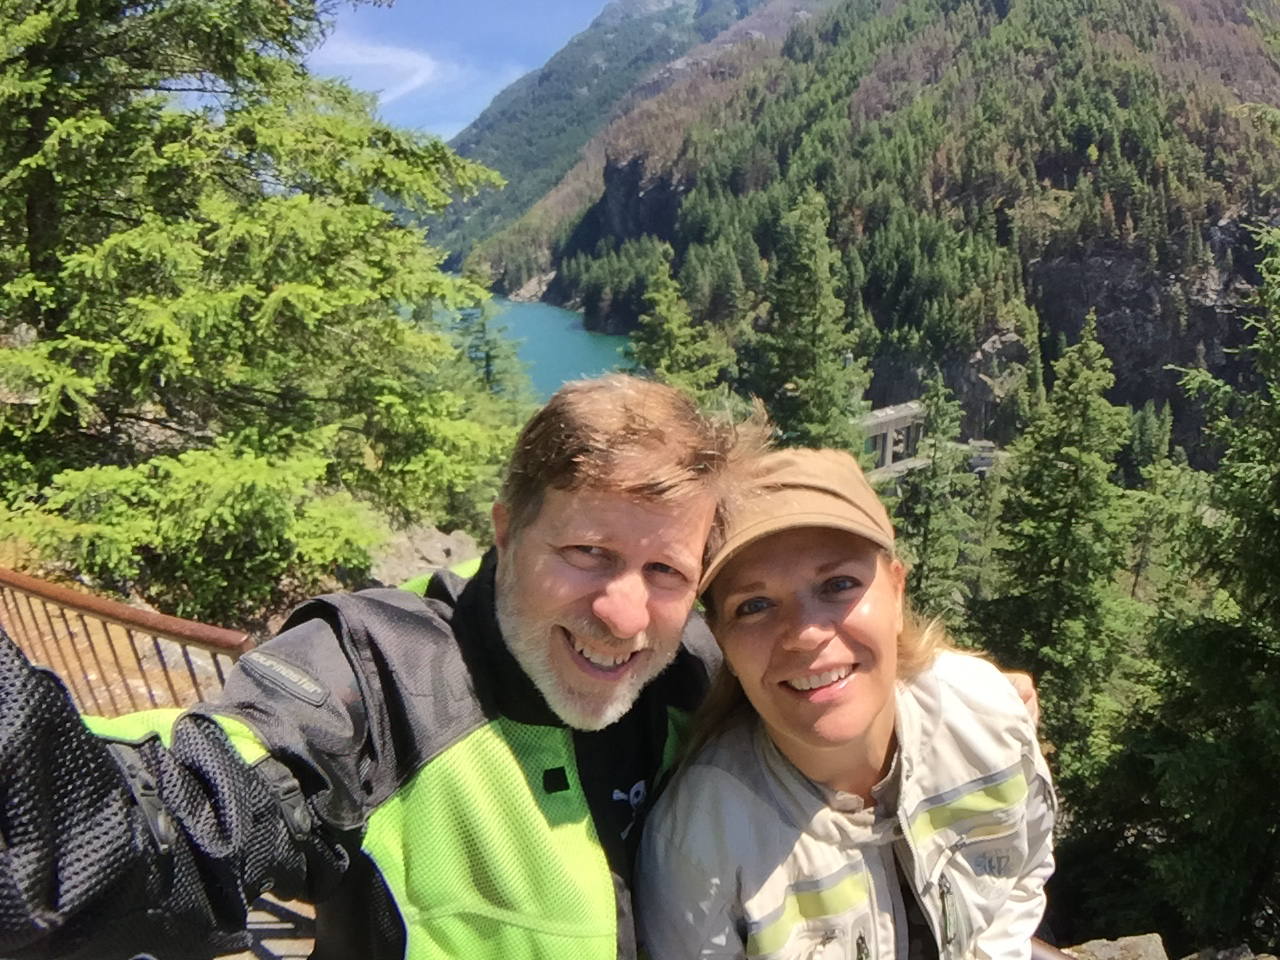 Steve and Doreen at Gorge Lake